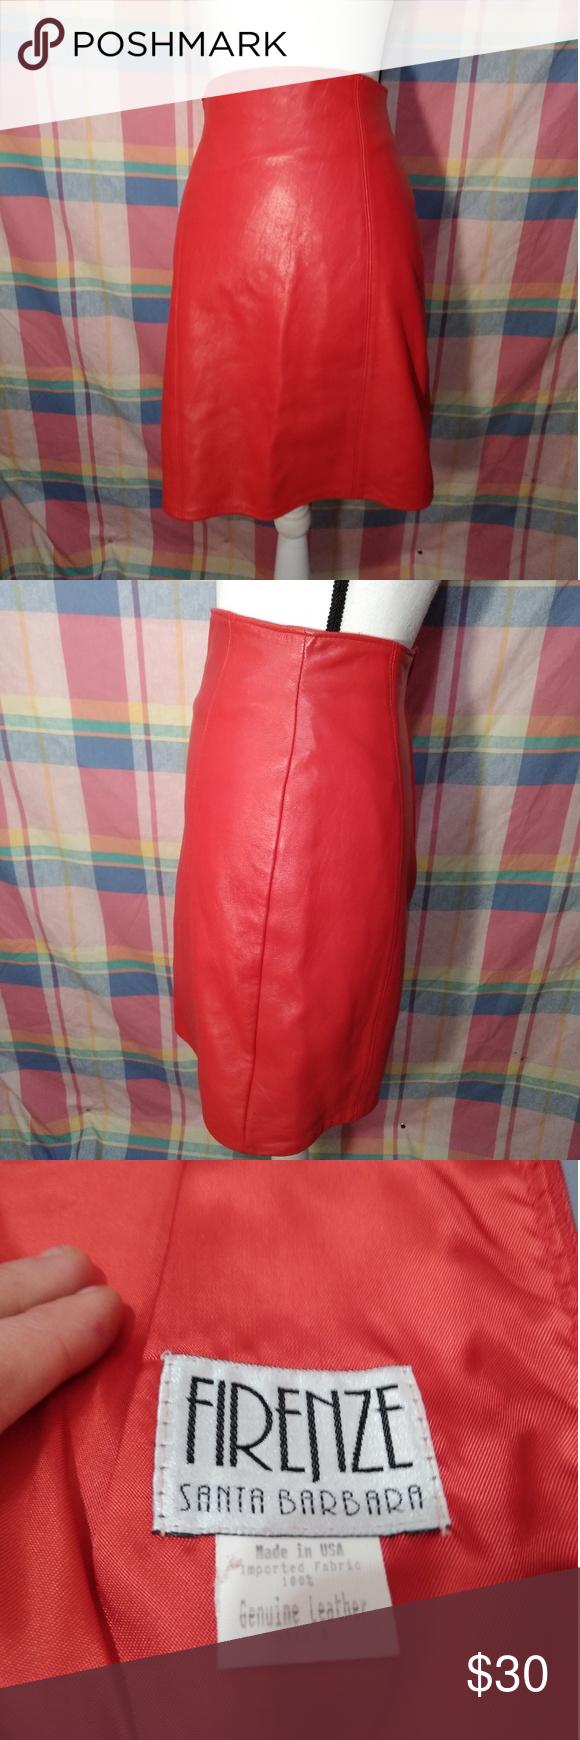 8e6e8c2cc1 VTG 80's High Waisted Leather FIRENZE Skirt 80's red leather high waisted  soft leather skirt,